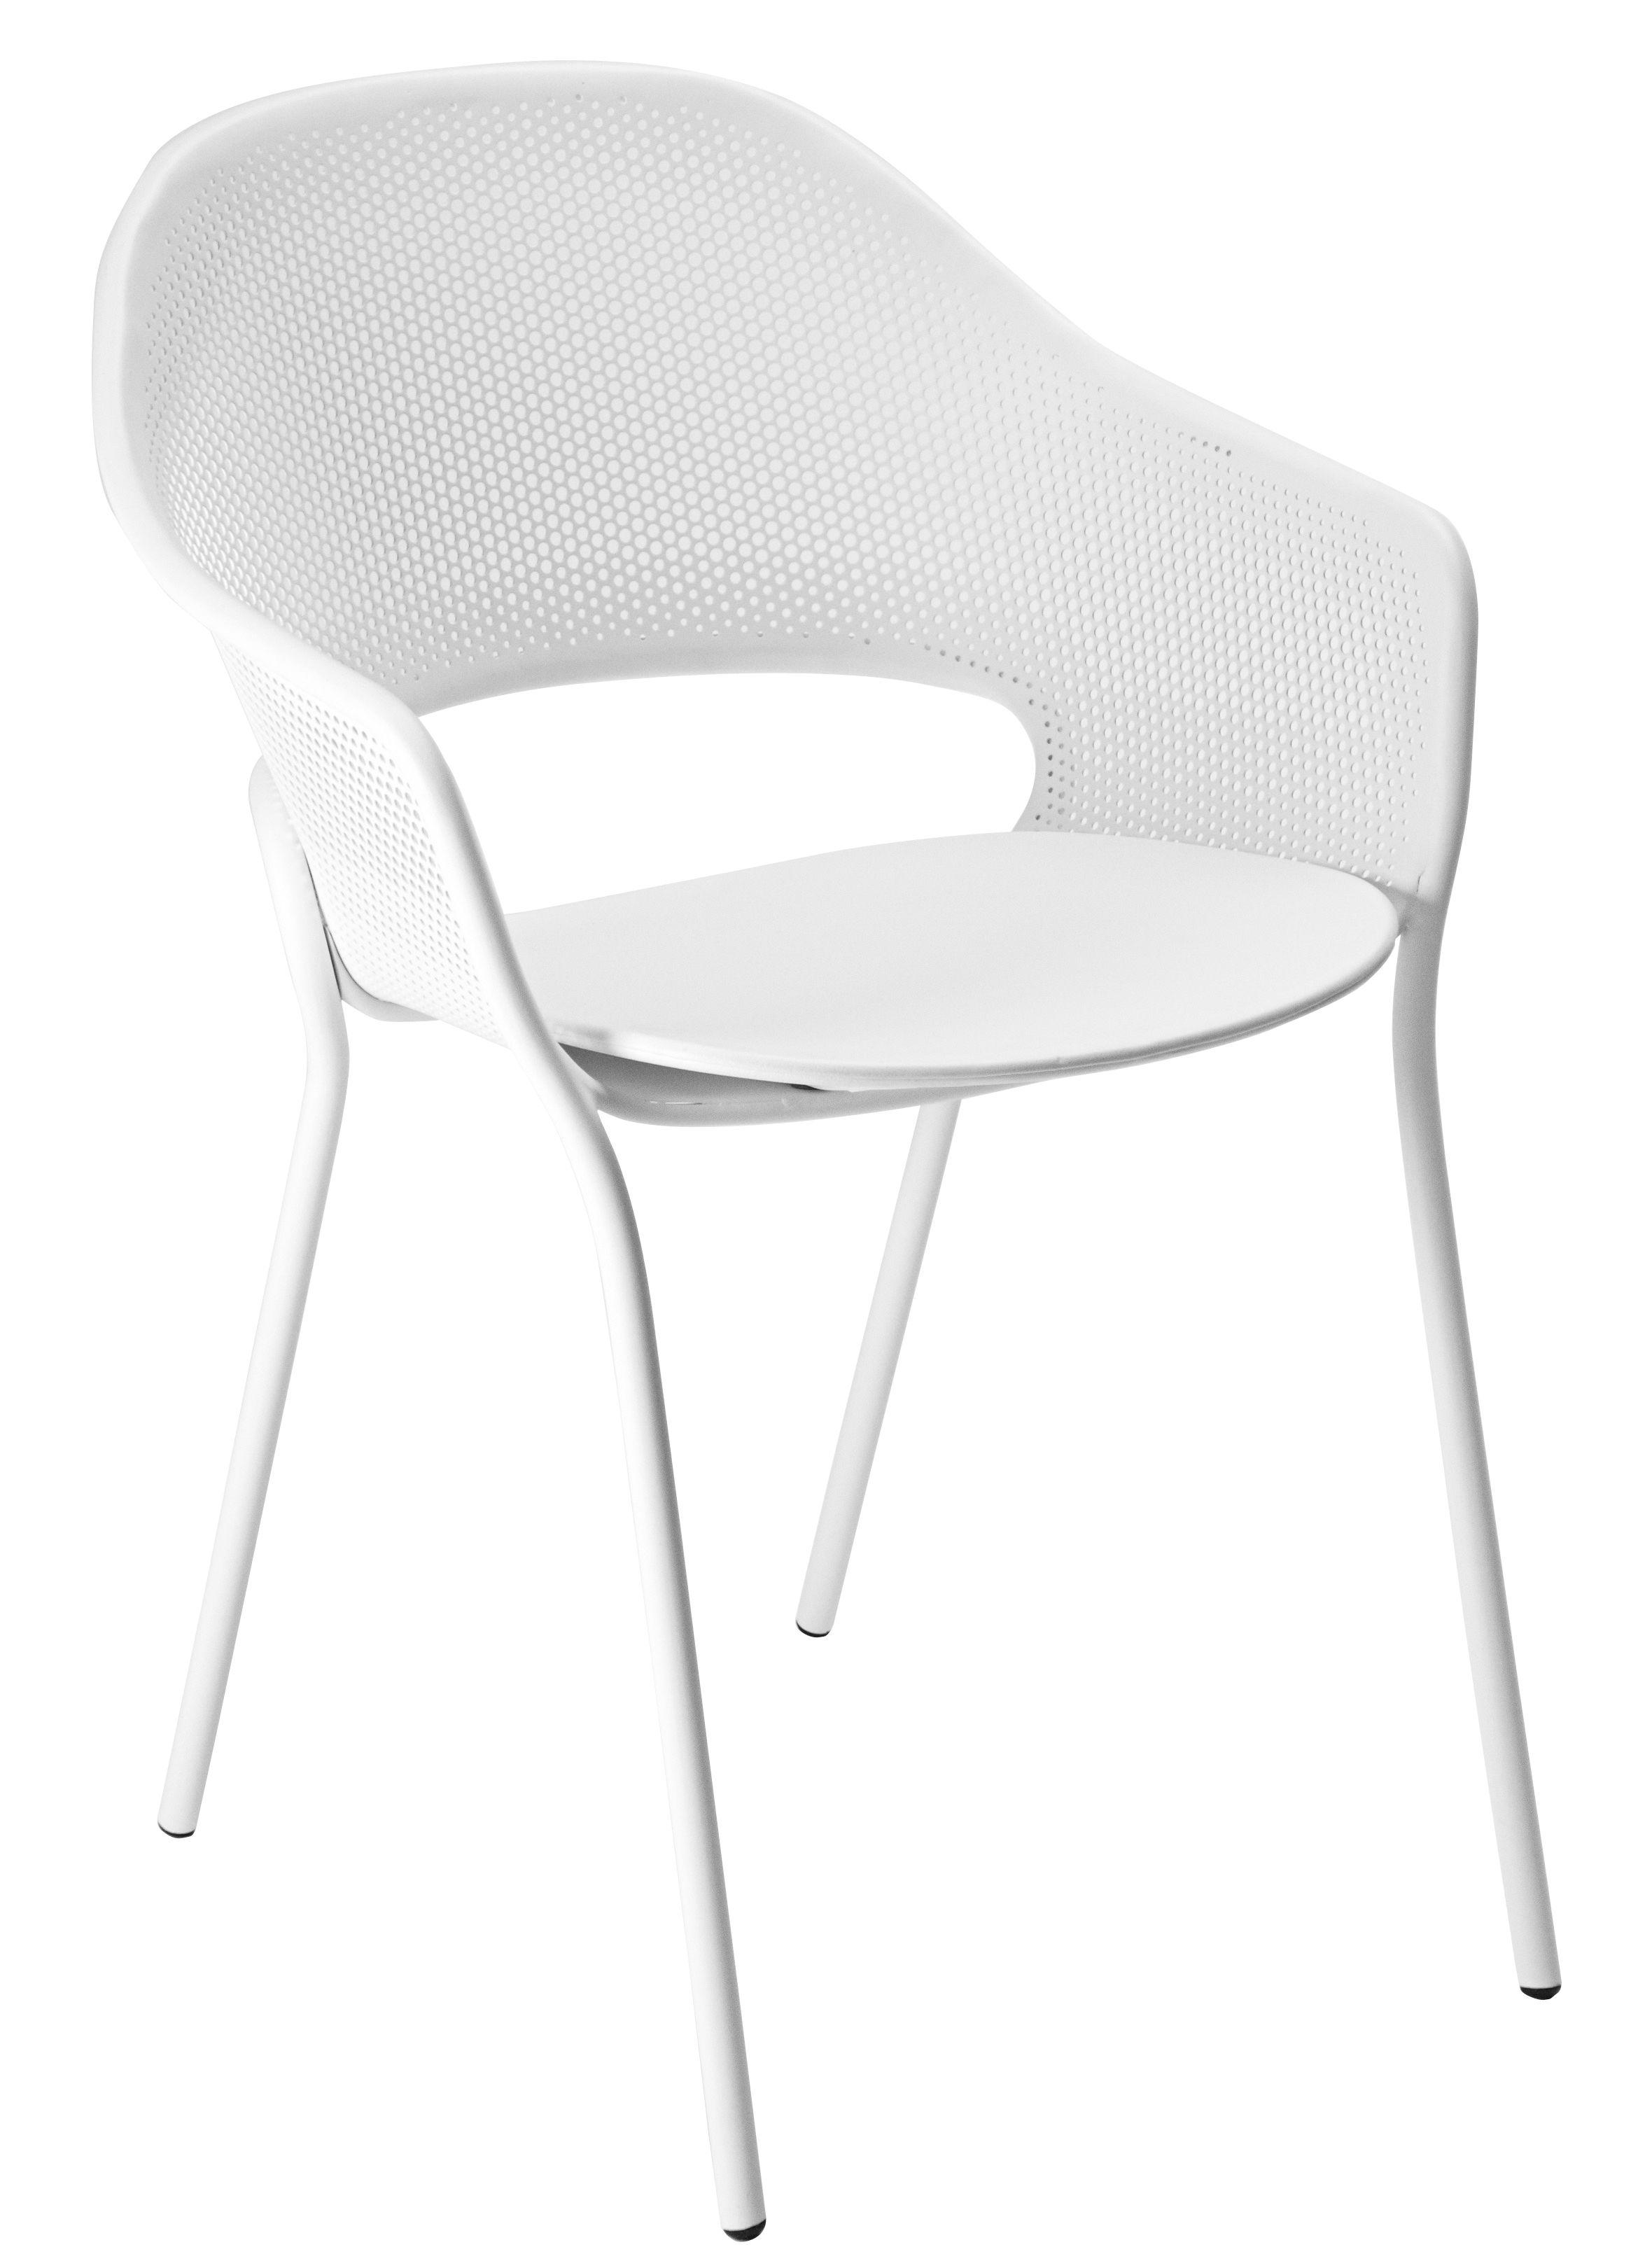 Möbel - Stühle  - Kate Stapelbarer Sessel / von Patrick Jouin - Metall - Fermob Idoles - Baumwollweiß - Stahl